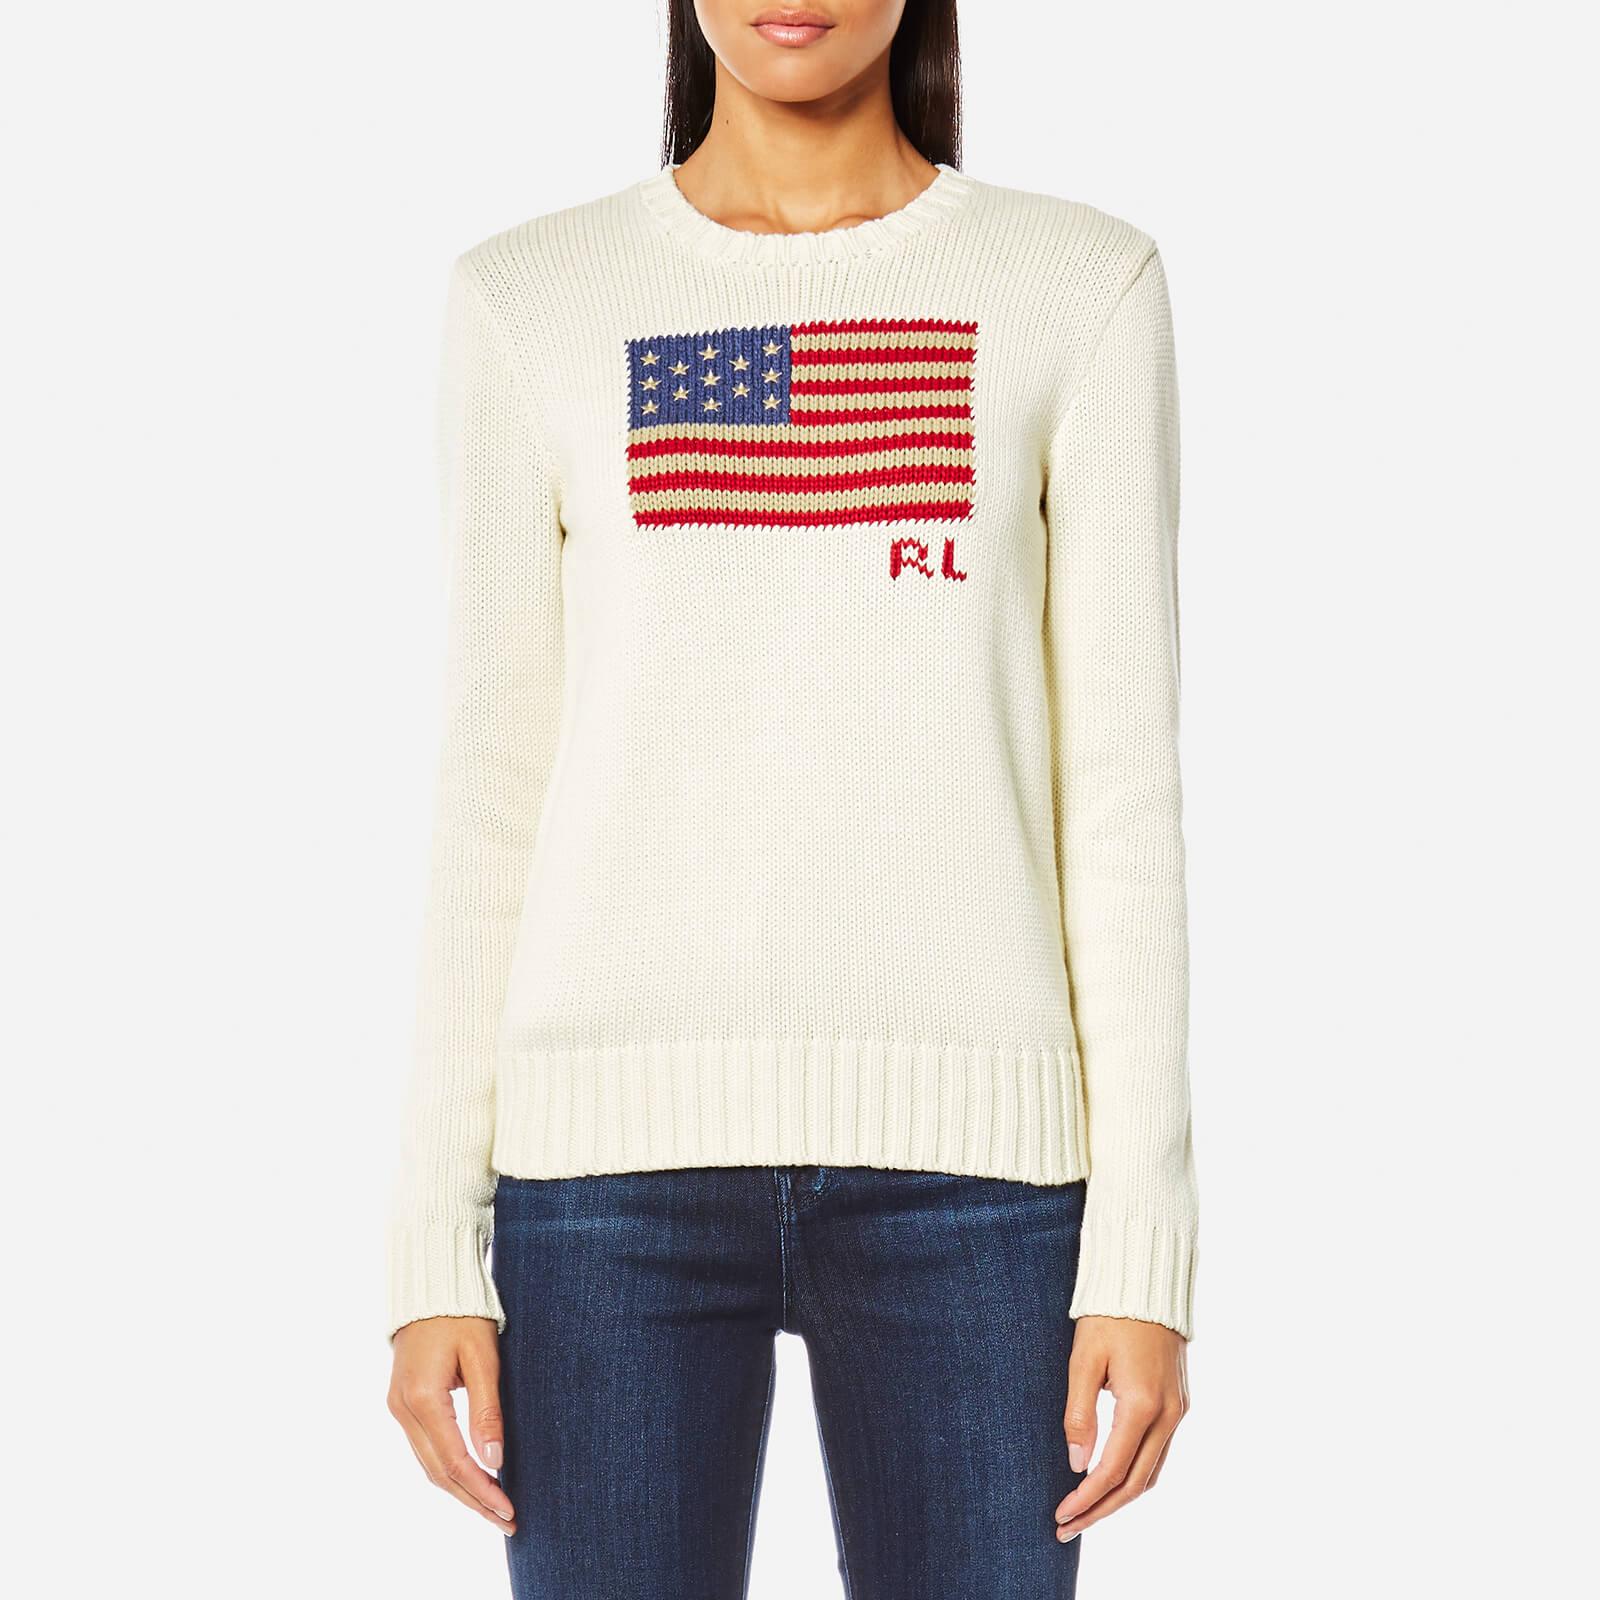 8b6e539ba93e Polo Ralph Lauren Women s Crew Neck Flag Jumper - Cream Multi